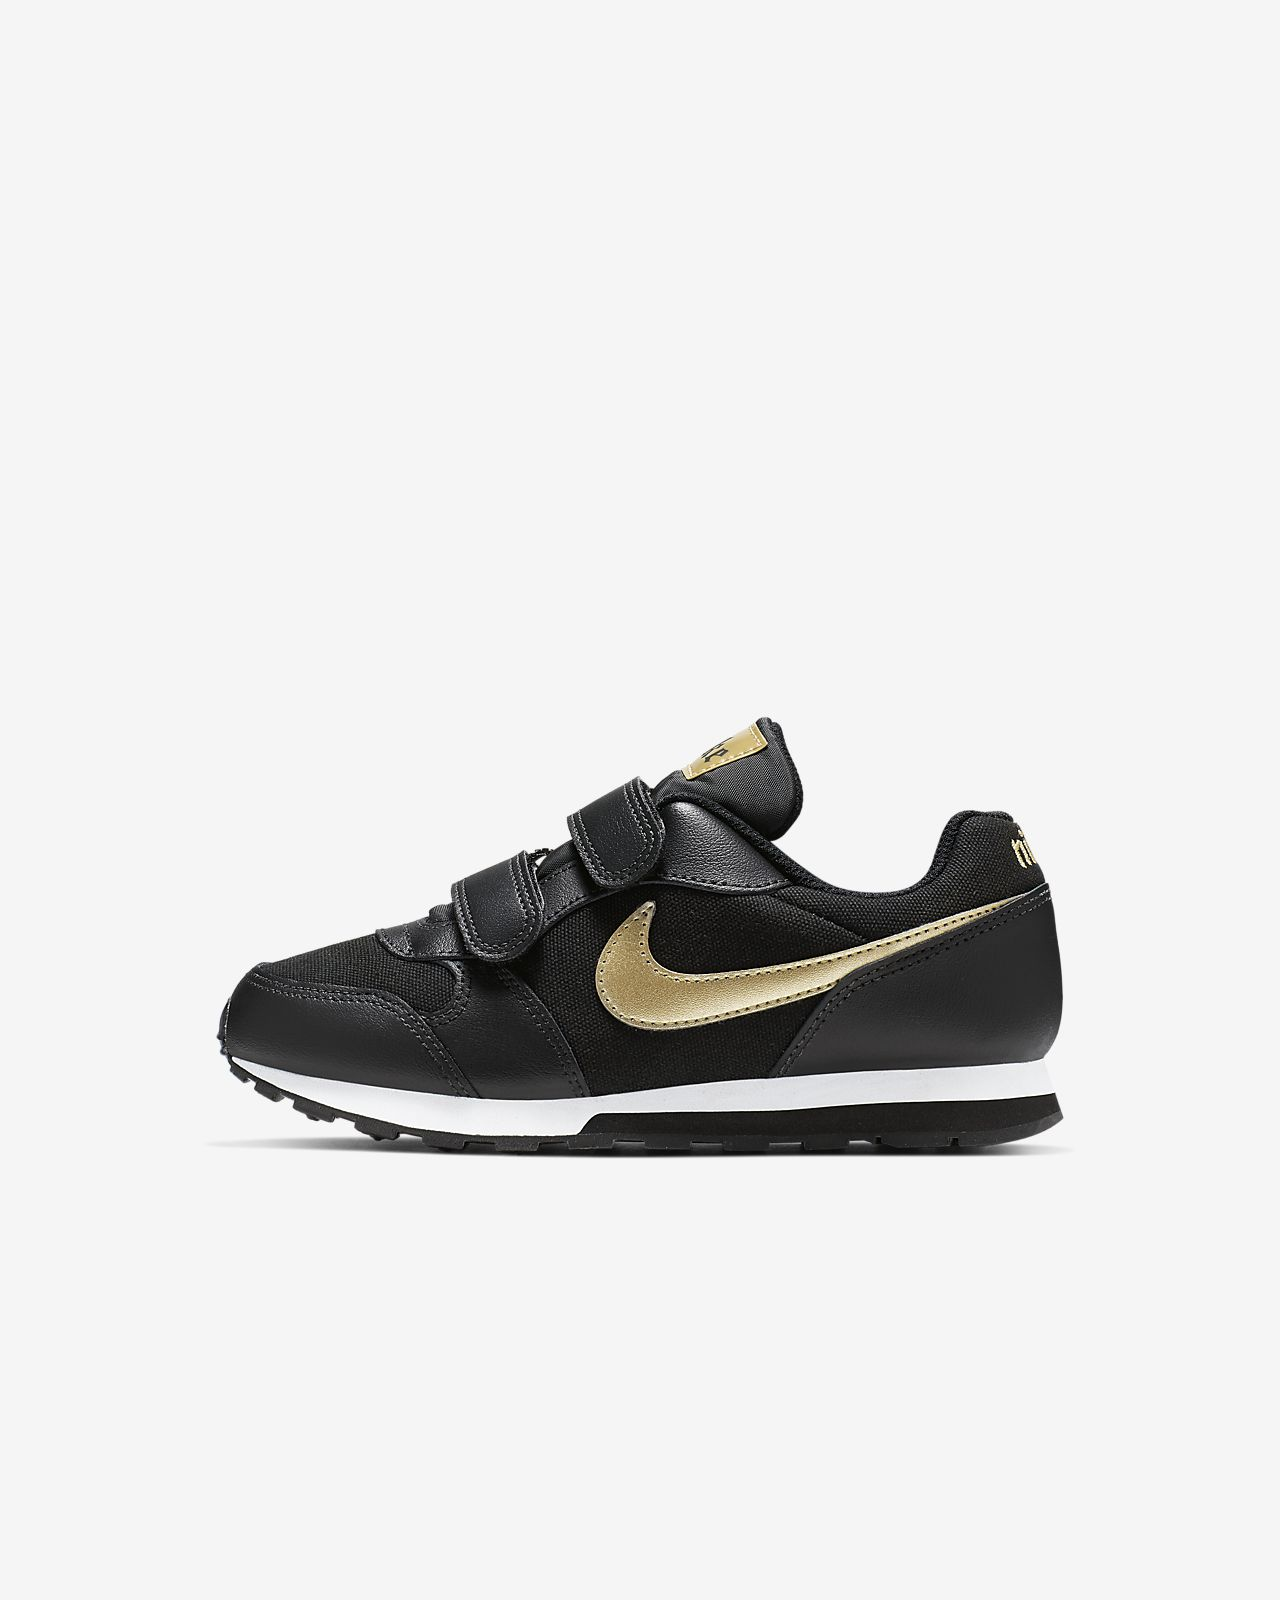 Chaussure Nike MD Runner 2 VTB pour Jeune enfant